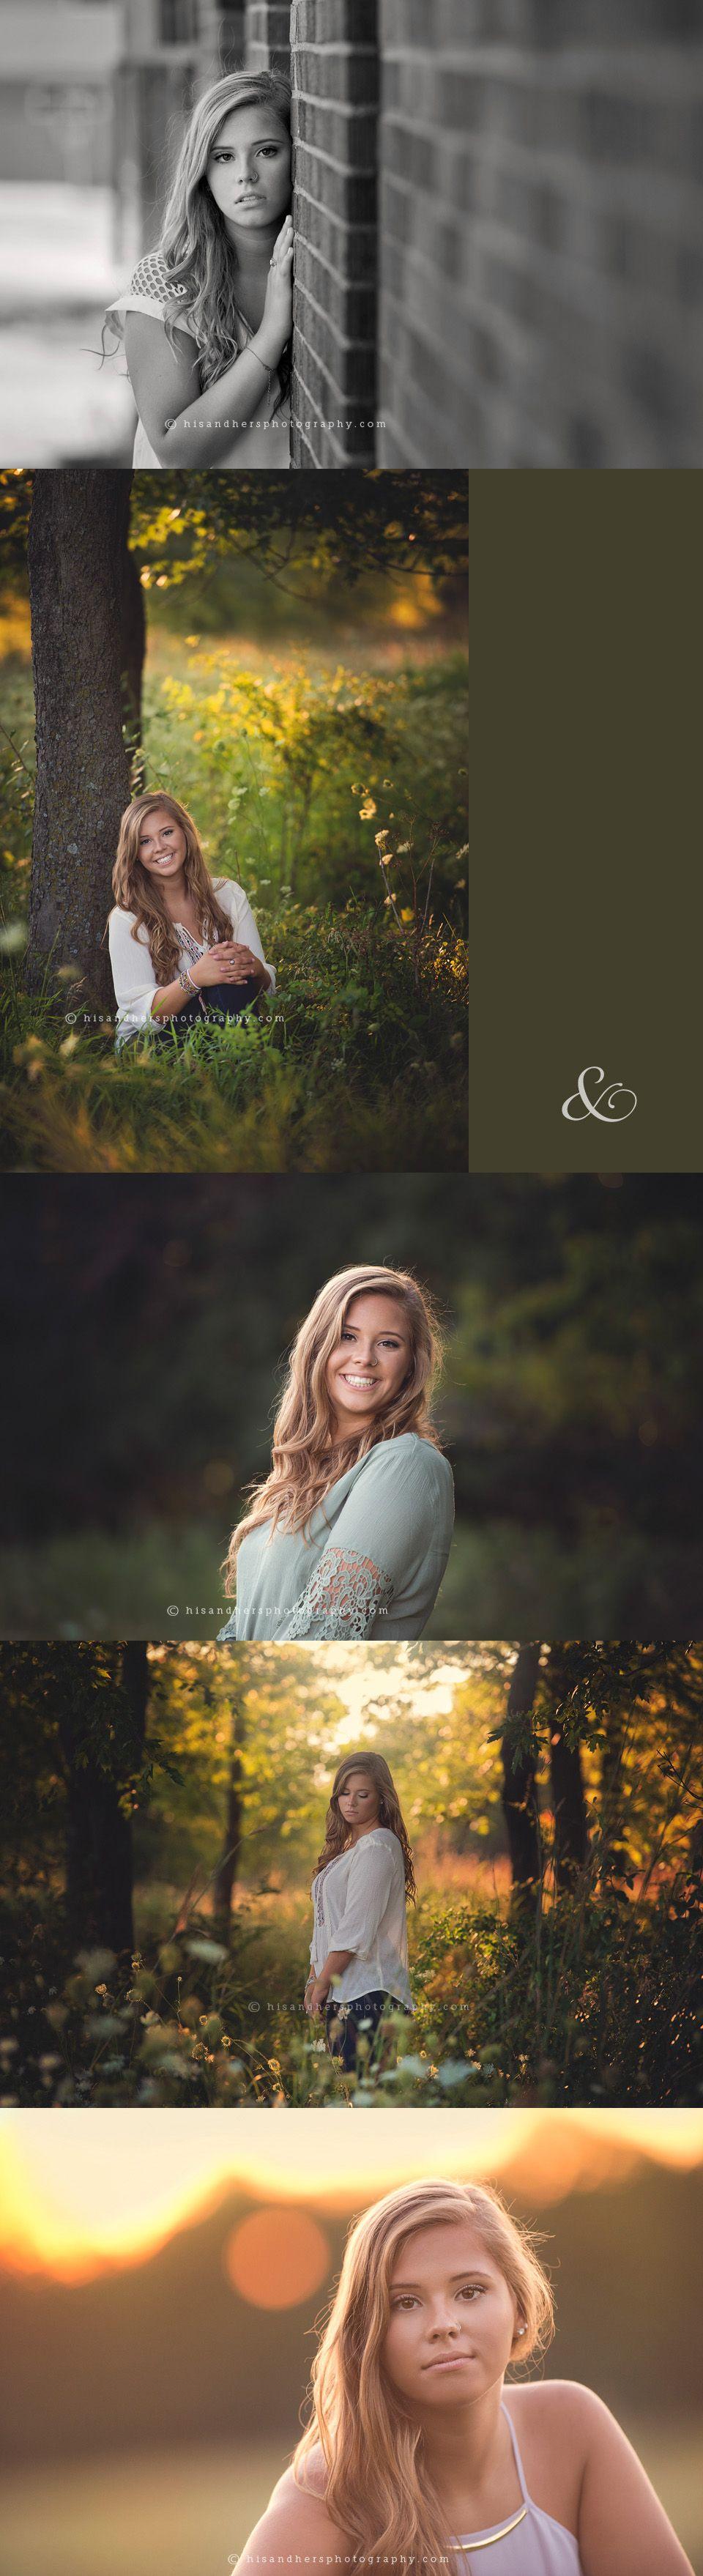 Senior | Kaitlyn, class of 2016